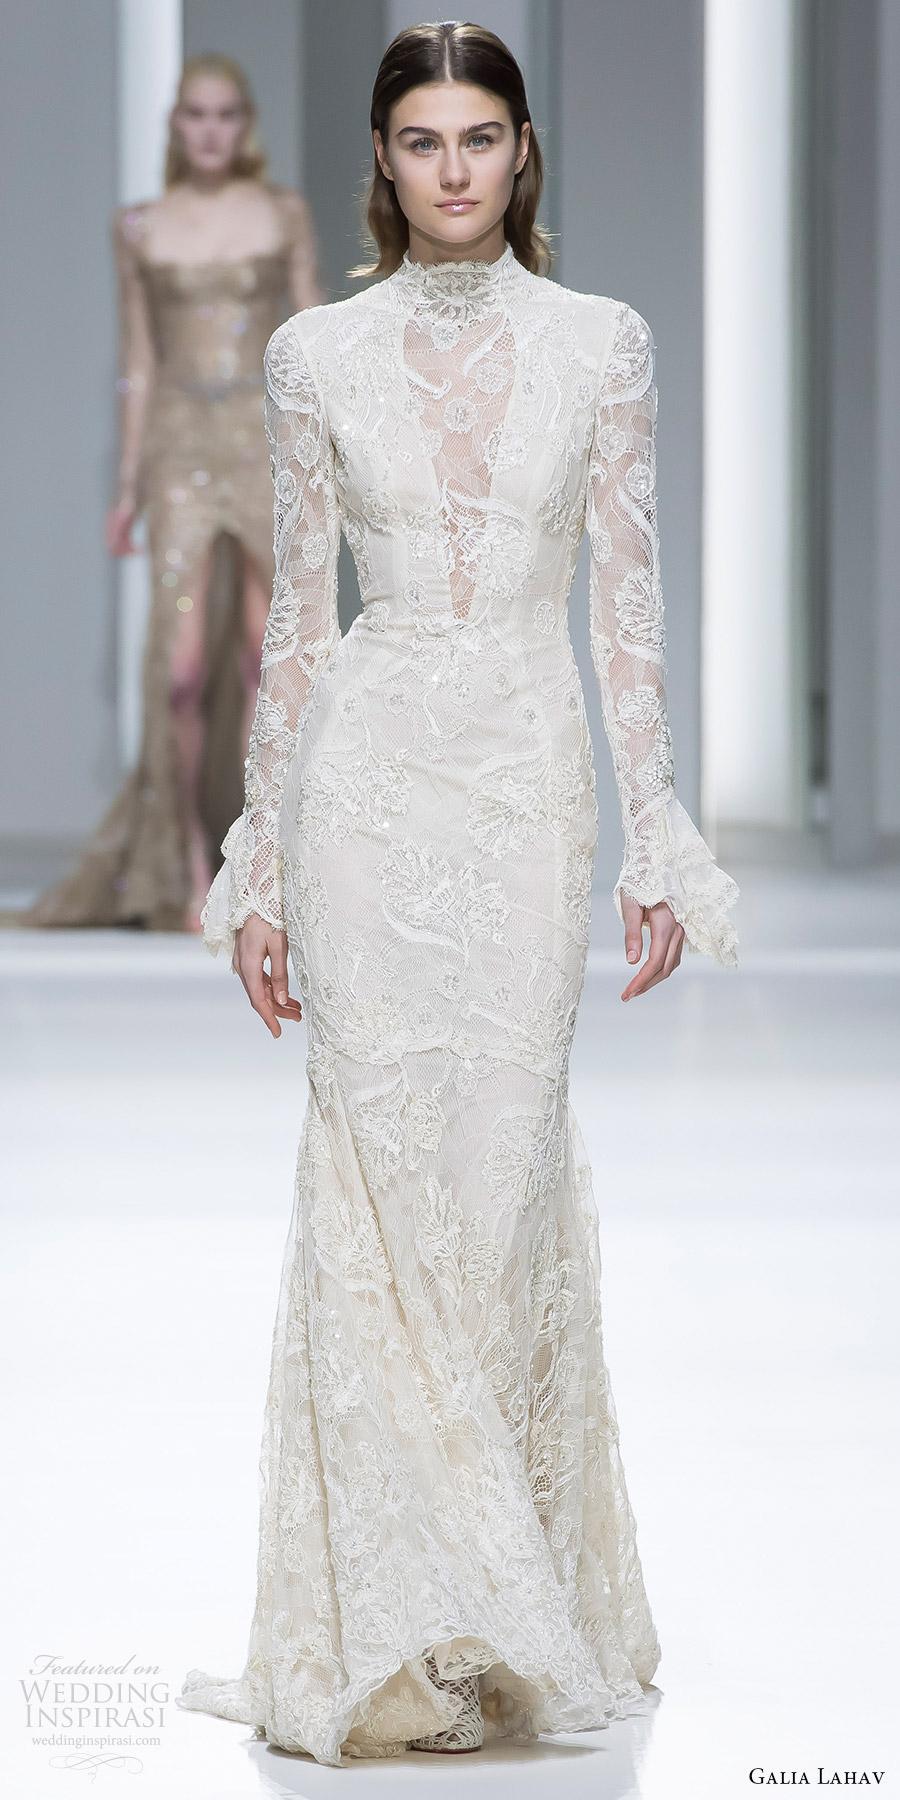 galia lahav haute couture spring 2017 (cecelia) gown